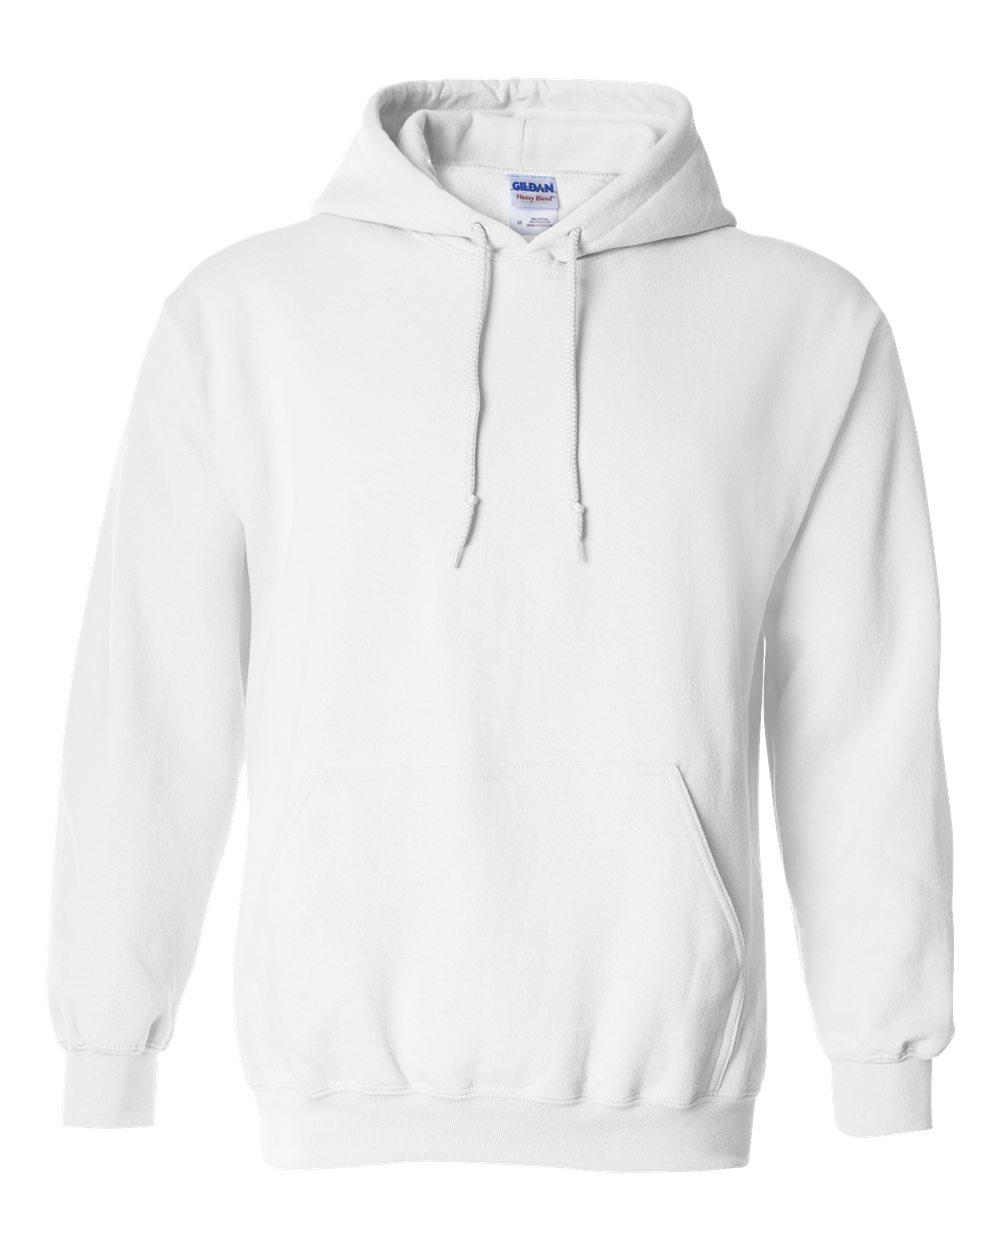 Custom Gildan Pullover Hoodie White.